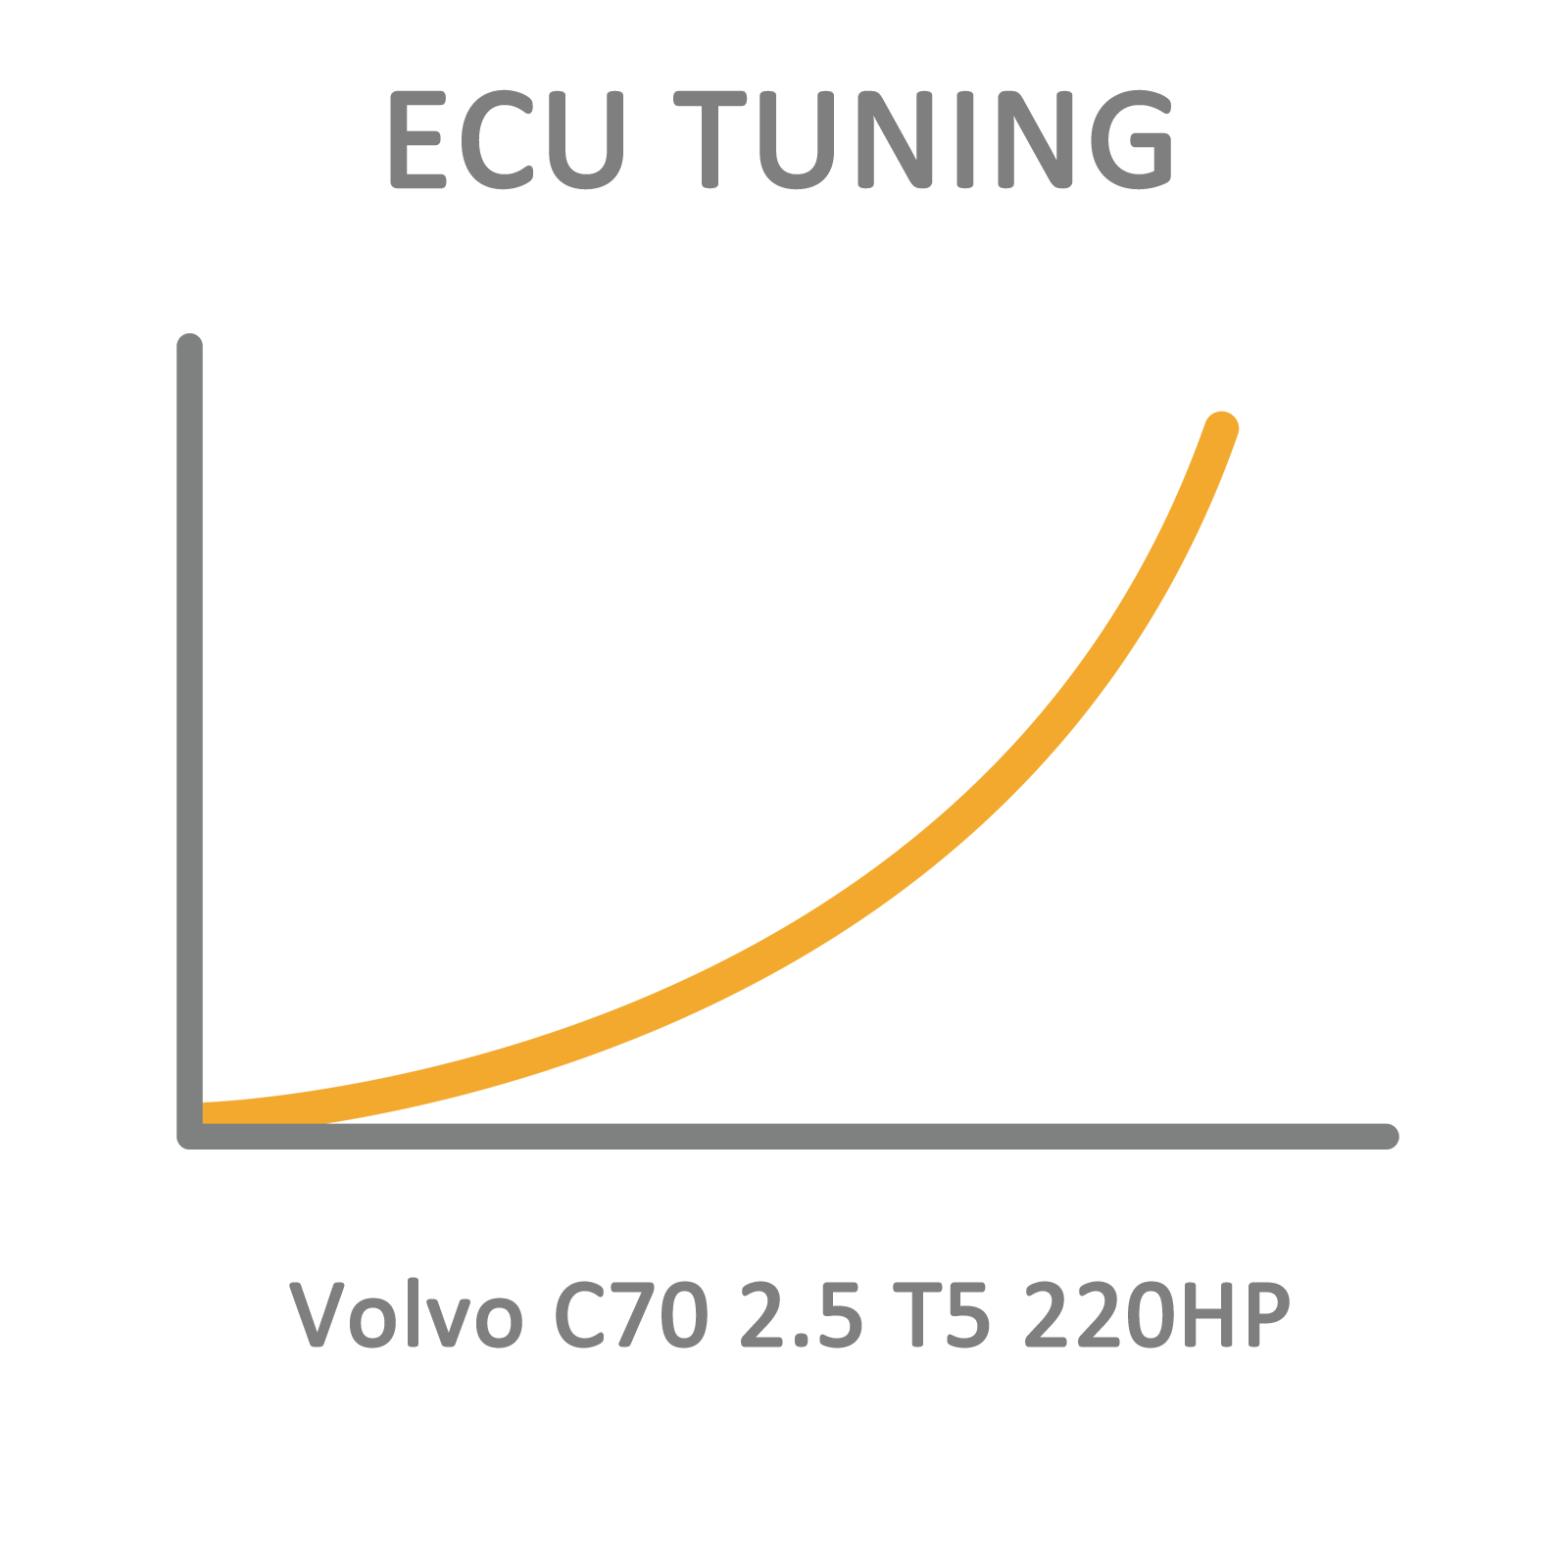 Volvo C70 2.5 T5 220HP ECU Tuning Remapping Programming